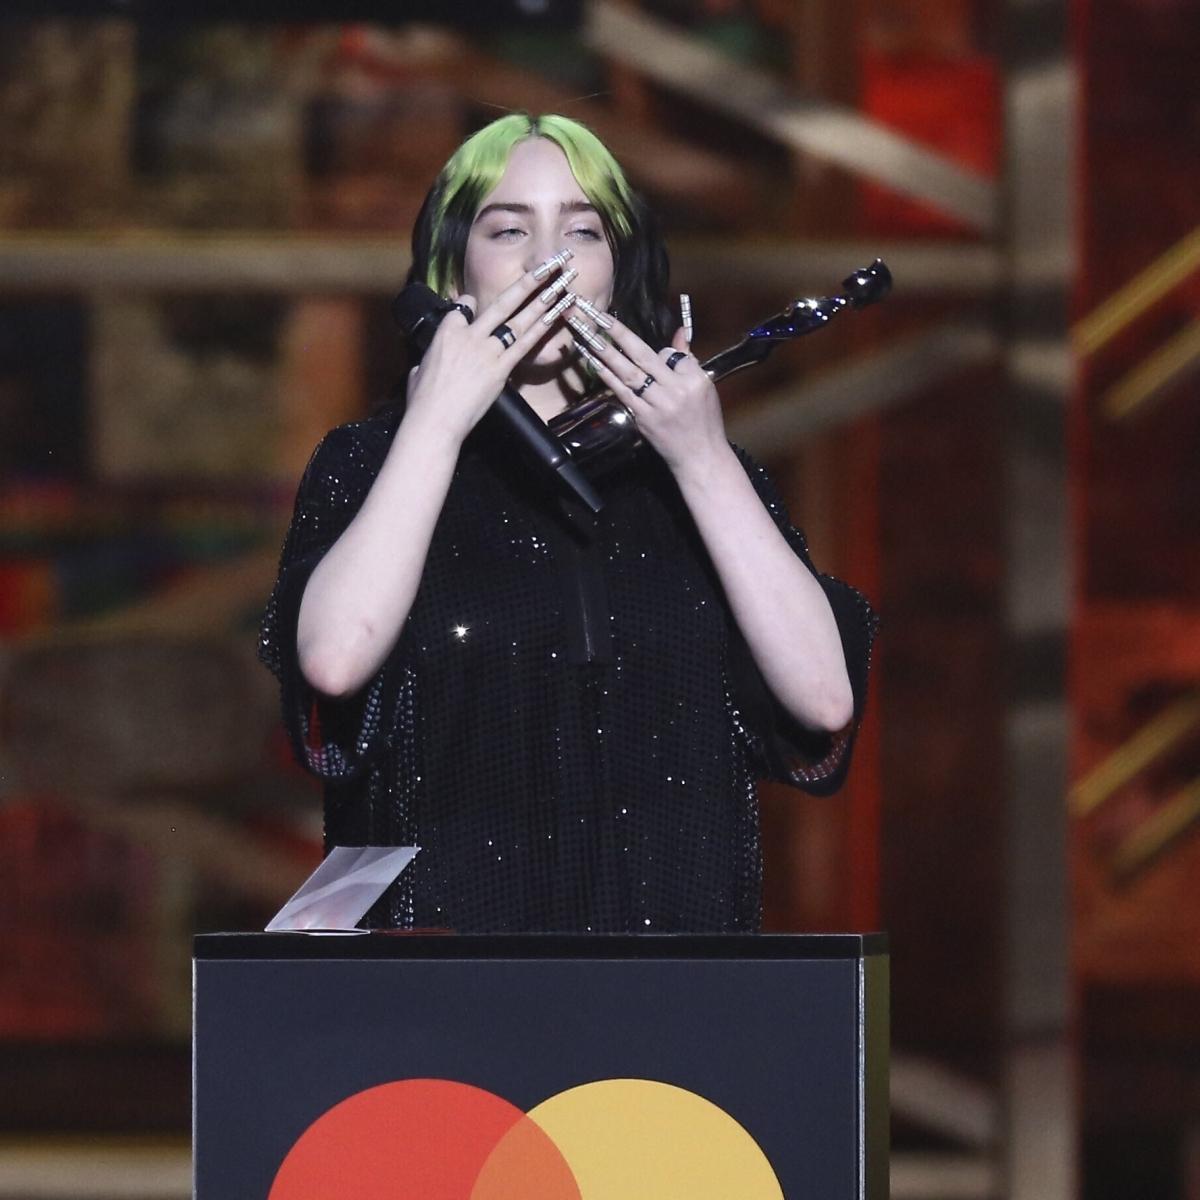 Billie Eilish breaks down at 2020 BRIT Awards